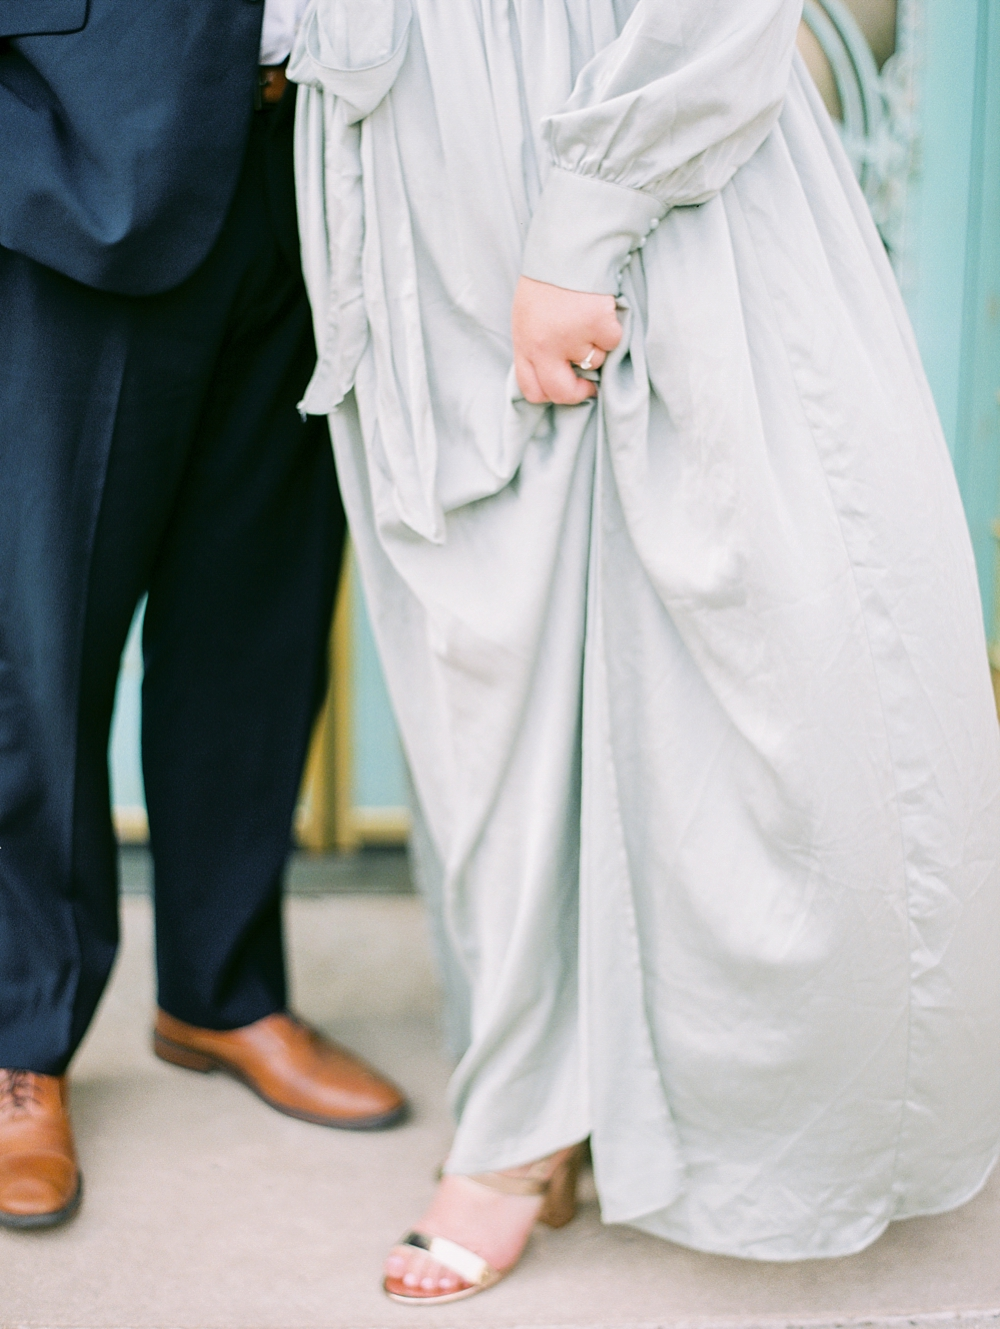 kristin-la-voie-photography-chicago-wedding-photographer-loyola-engagement-73